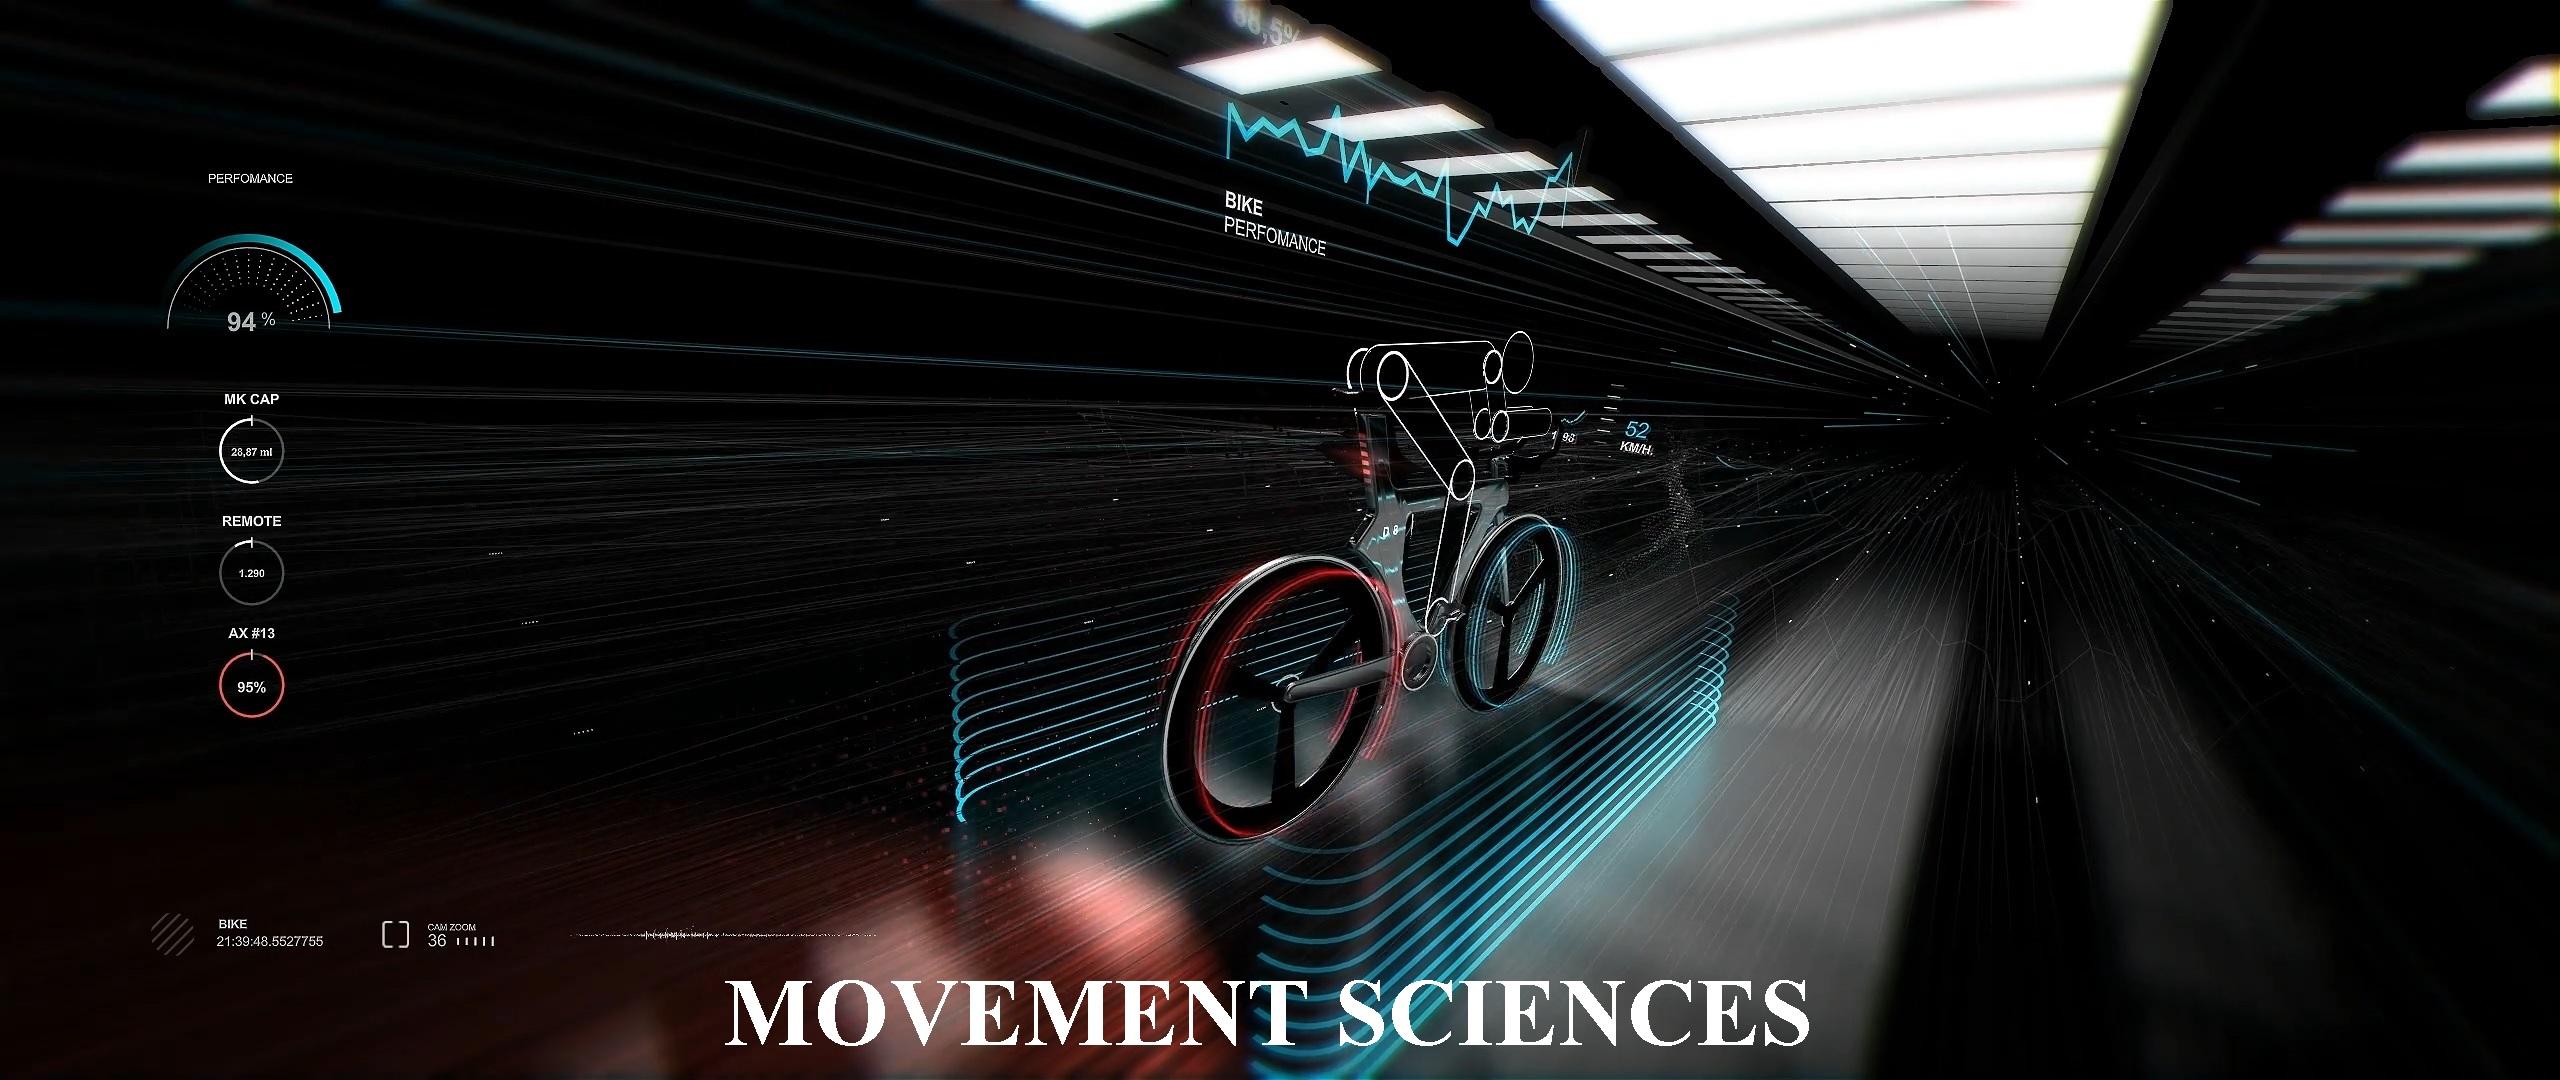 MARKET MOVEMENT SCIENCE